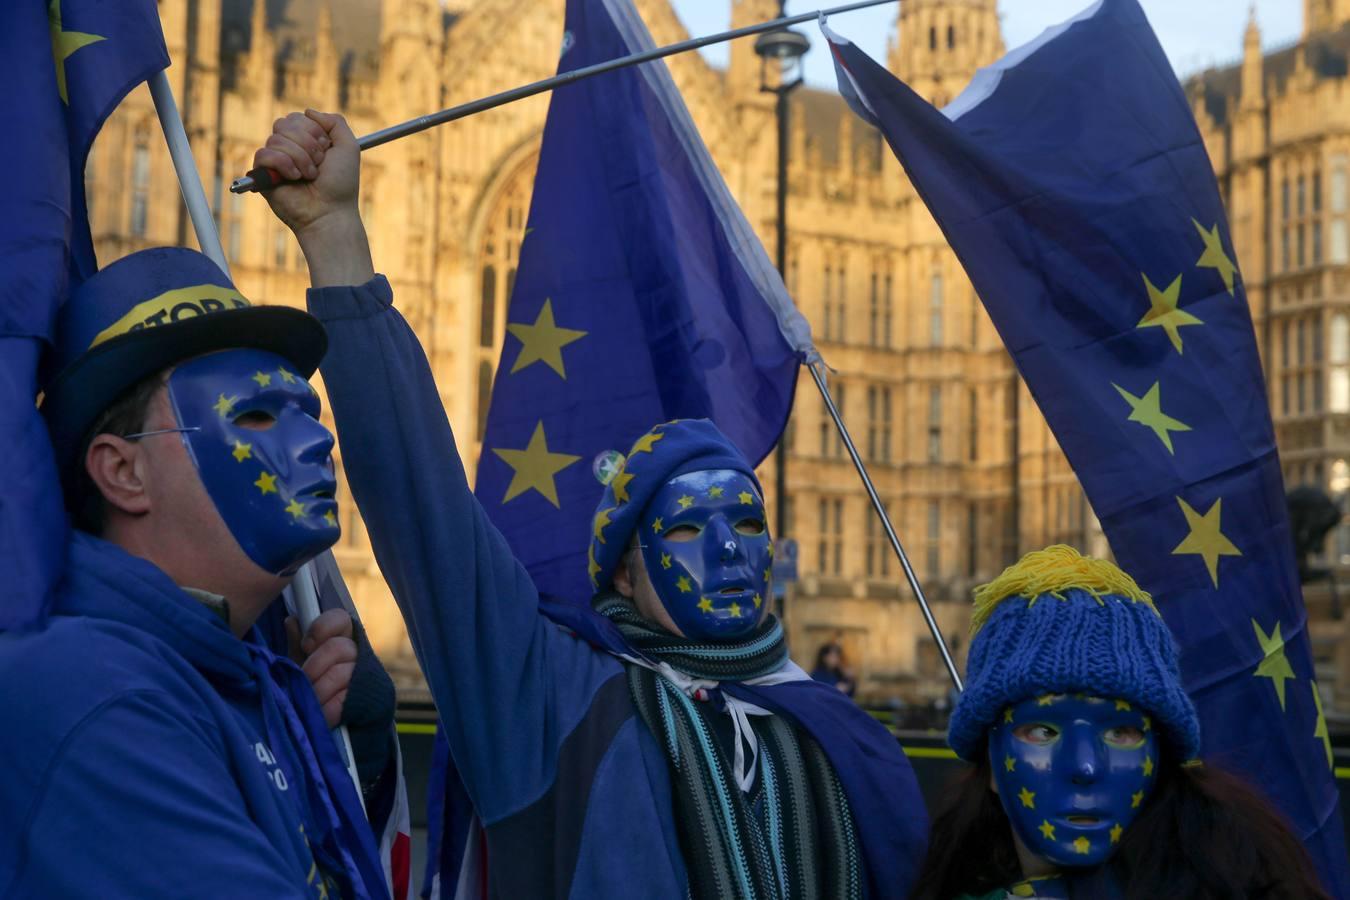 Manifestantes pro-Unión Europea en Londres